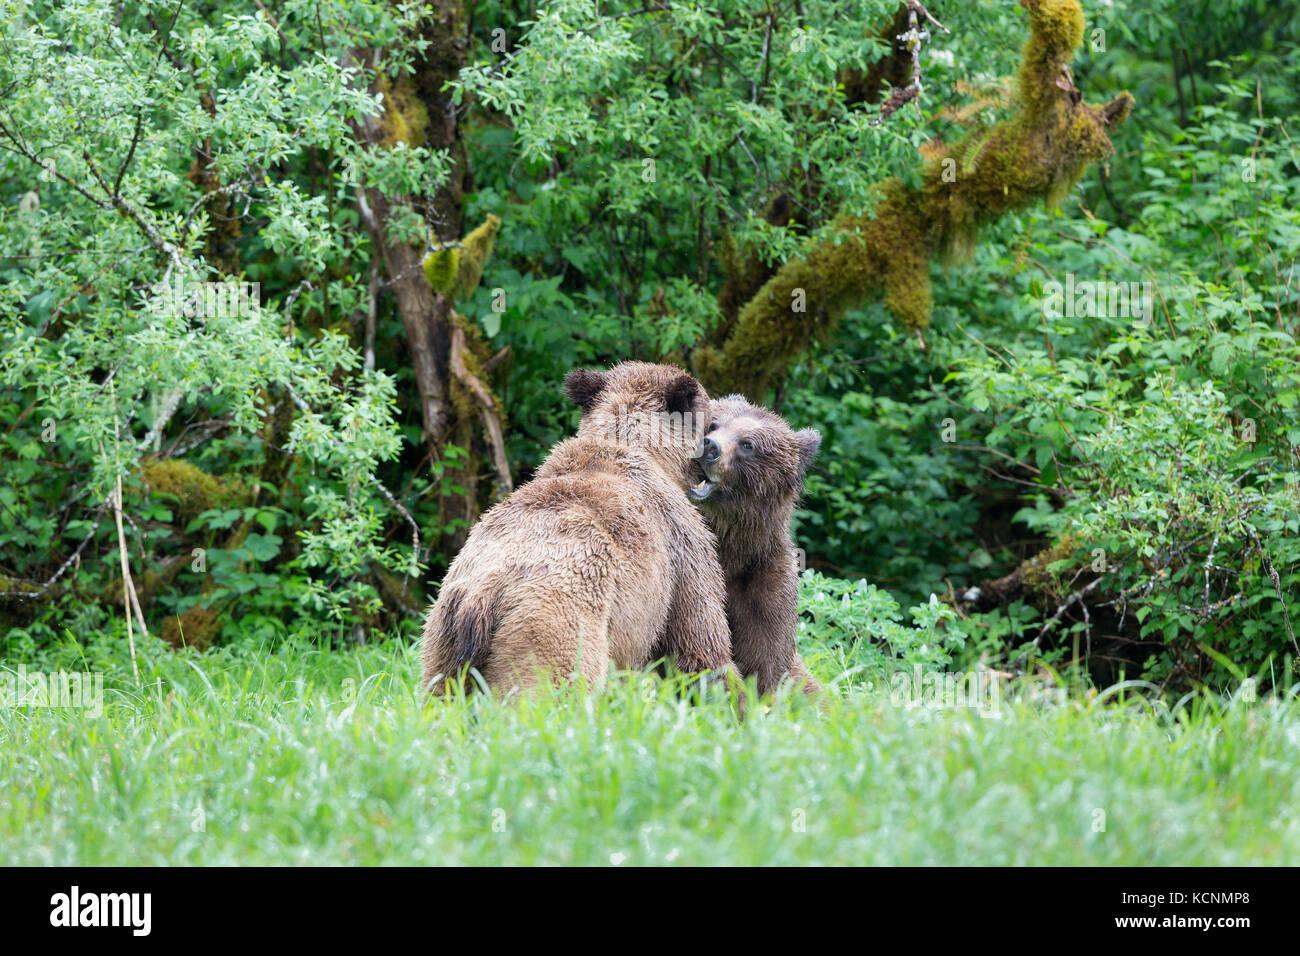 Grizzly bear (Ursus arctos horribilis), young male (left) and female courting, Khutzeymateen Inlet, Khutzeymateen - Stock Image